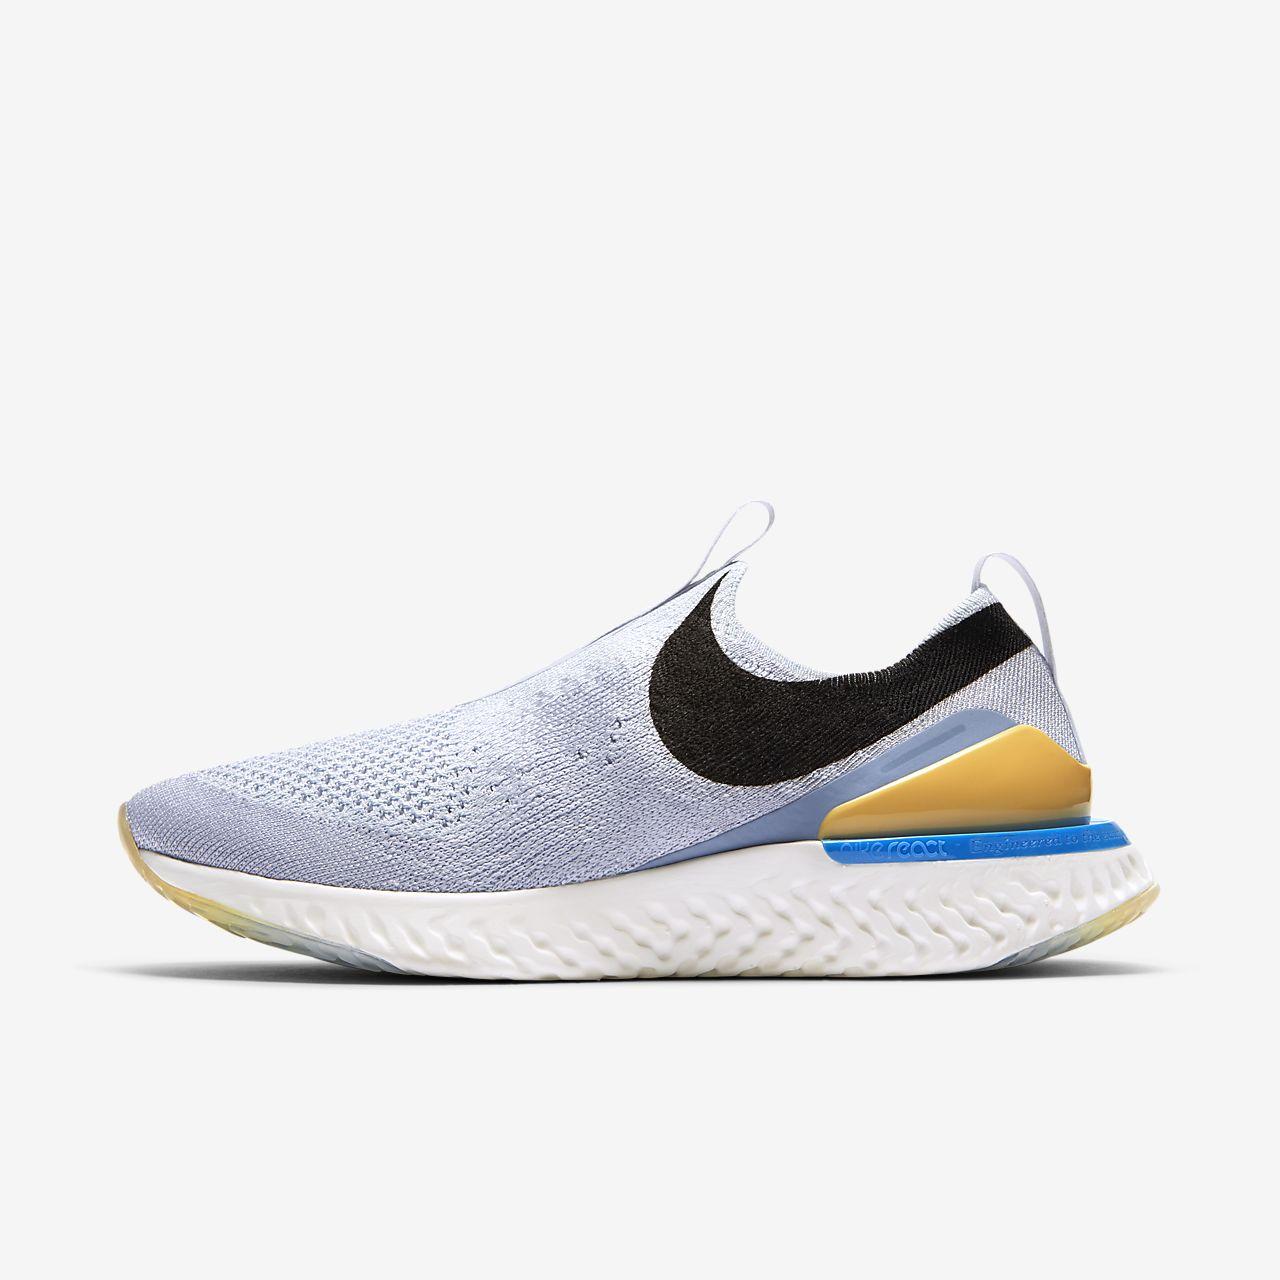 Chaussure de running Nike Epic Phantom React pour Femme